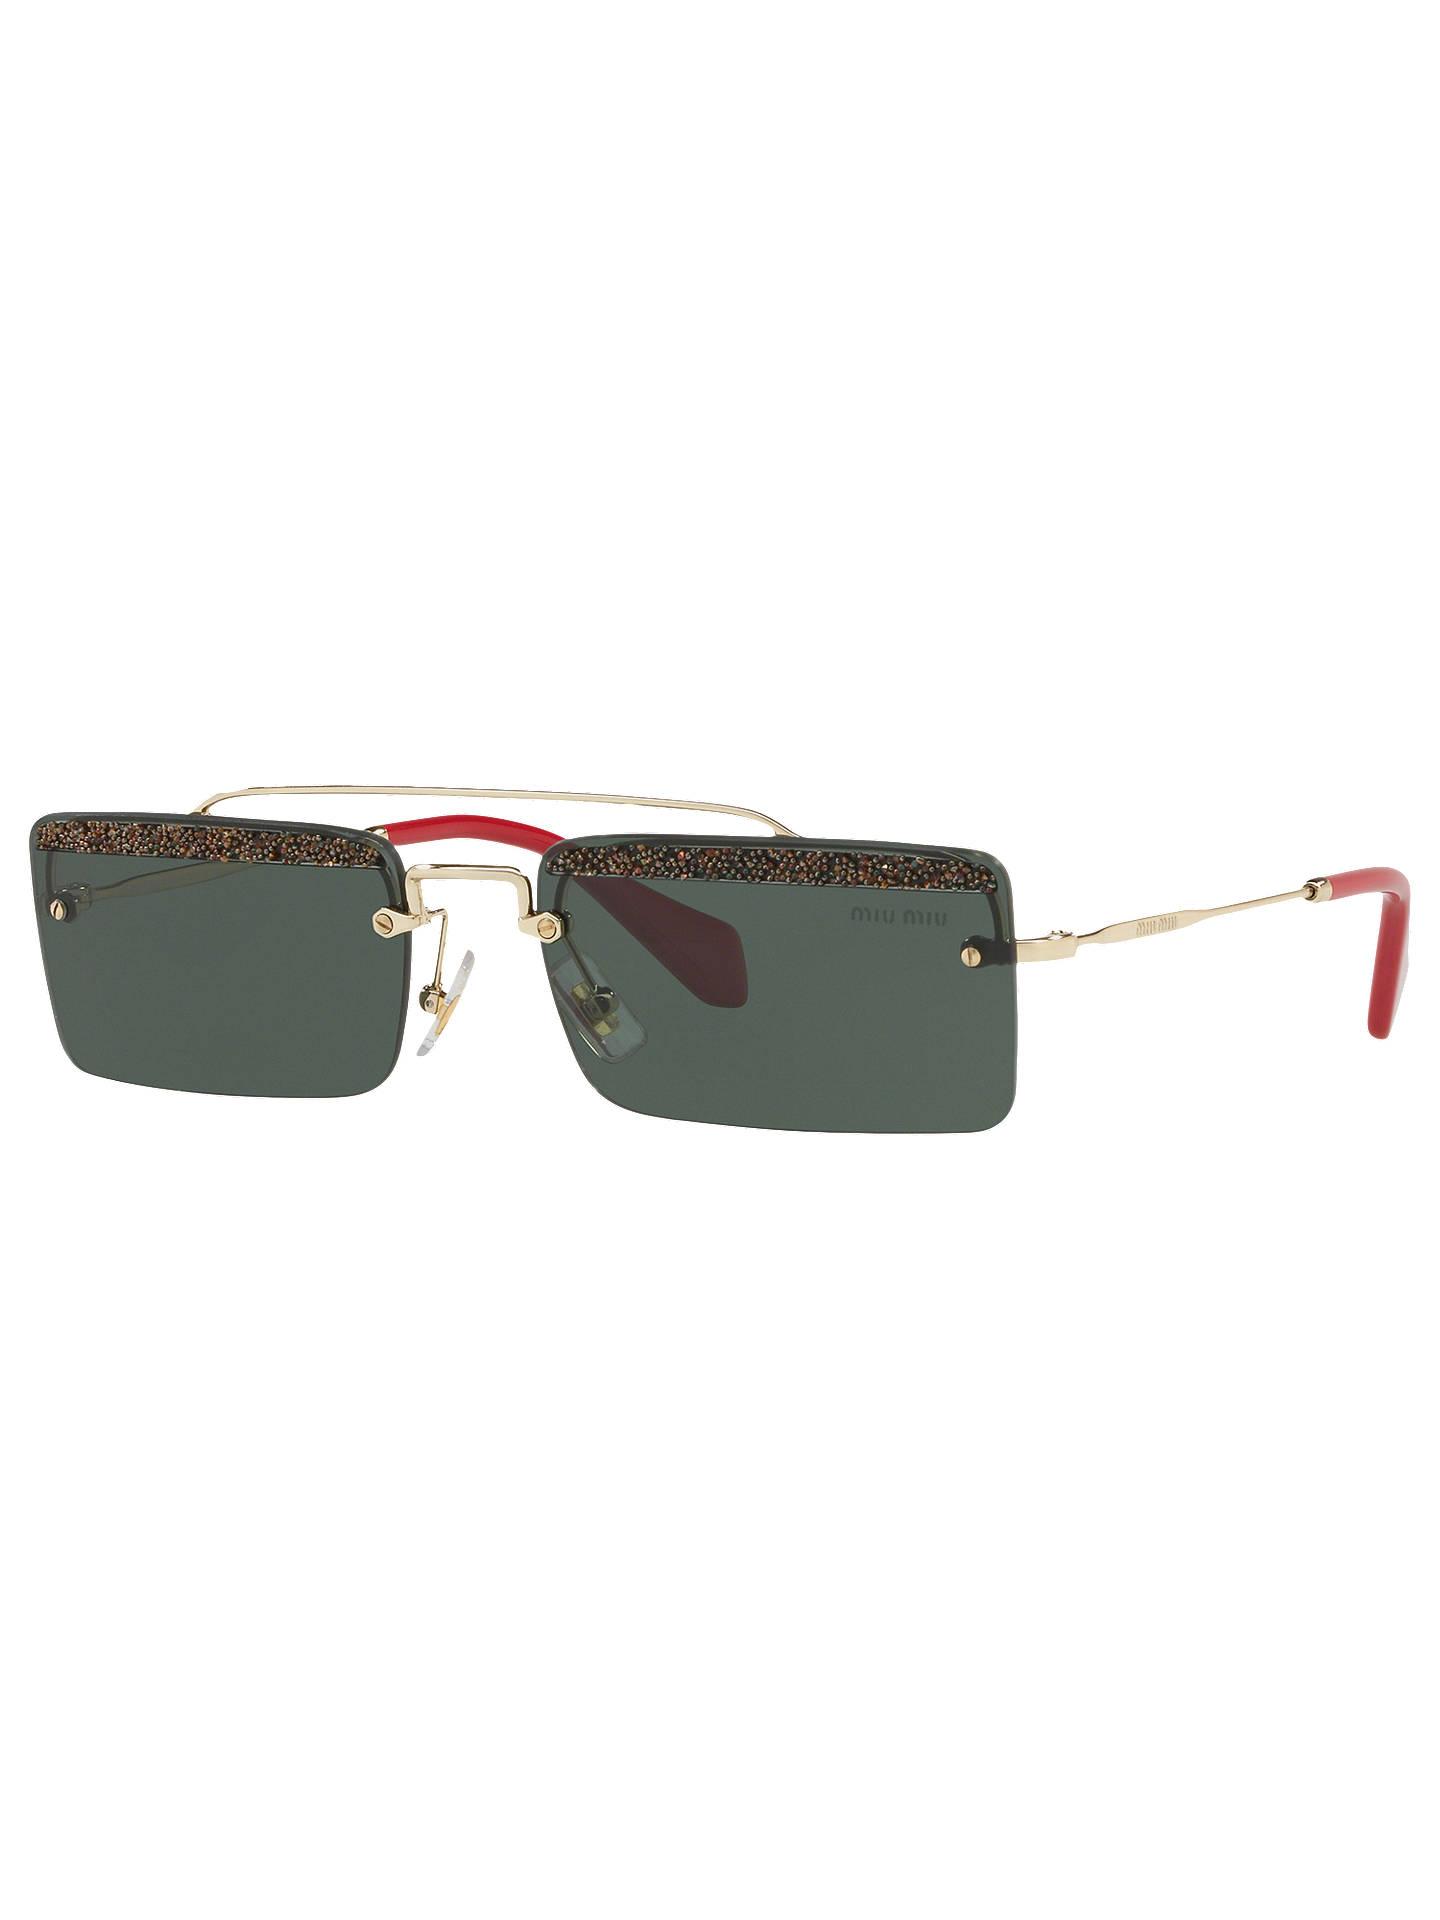 56d11a371 Buy Miu Miu MU 59TS Women's Embellished Rectangular Sunglasses, Light  Gold/Green Online at ...